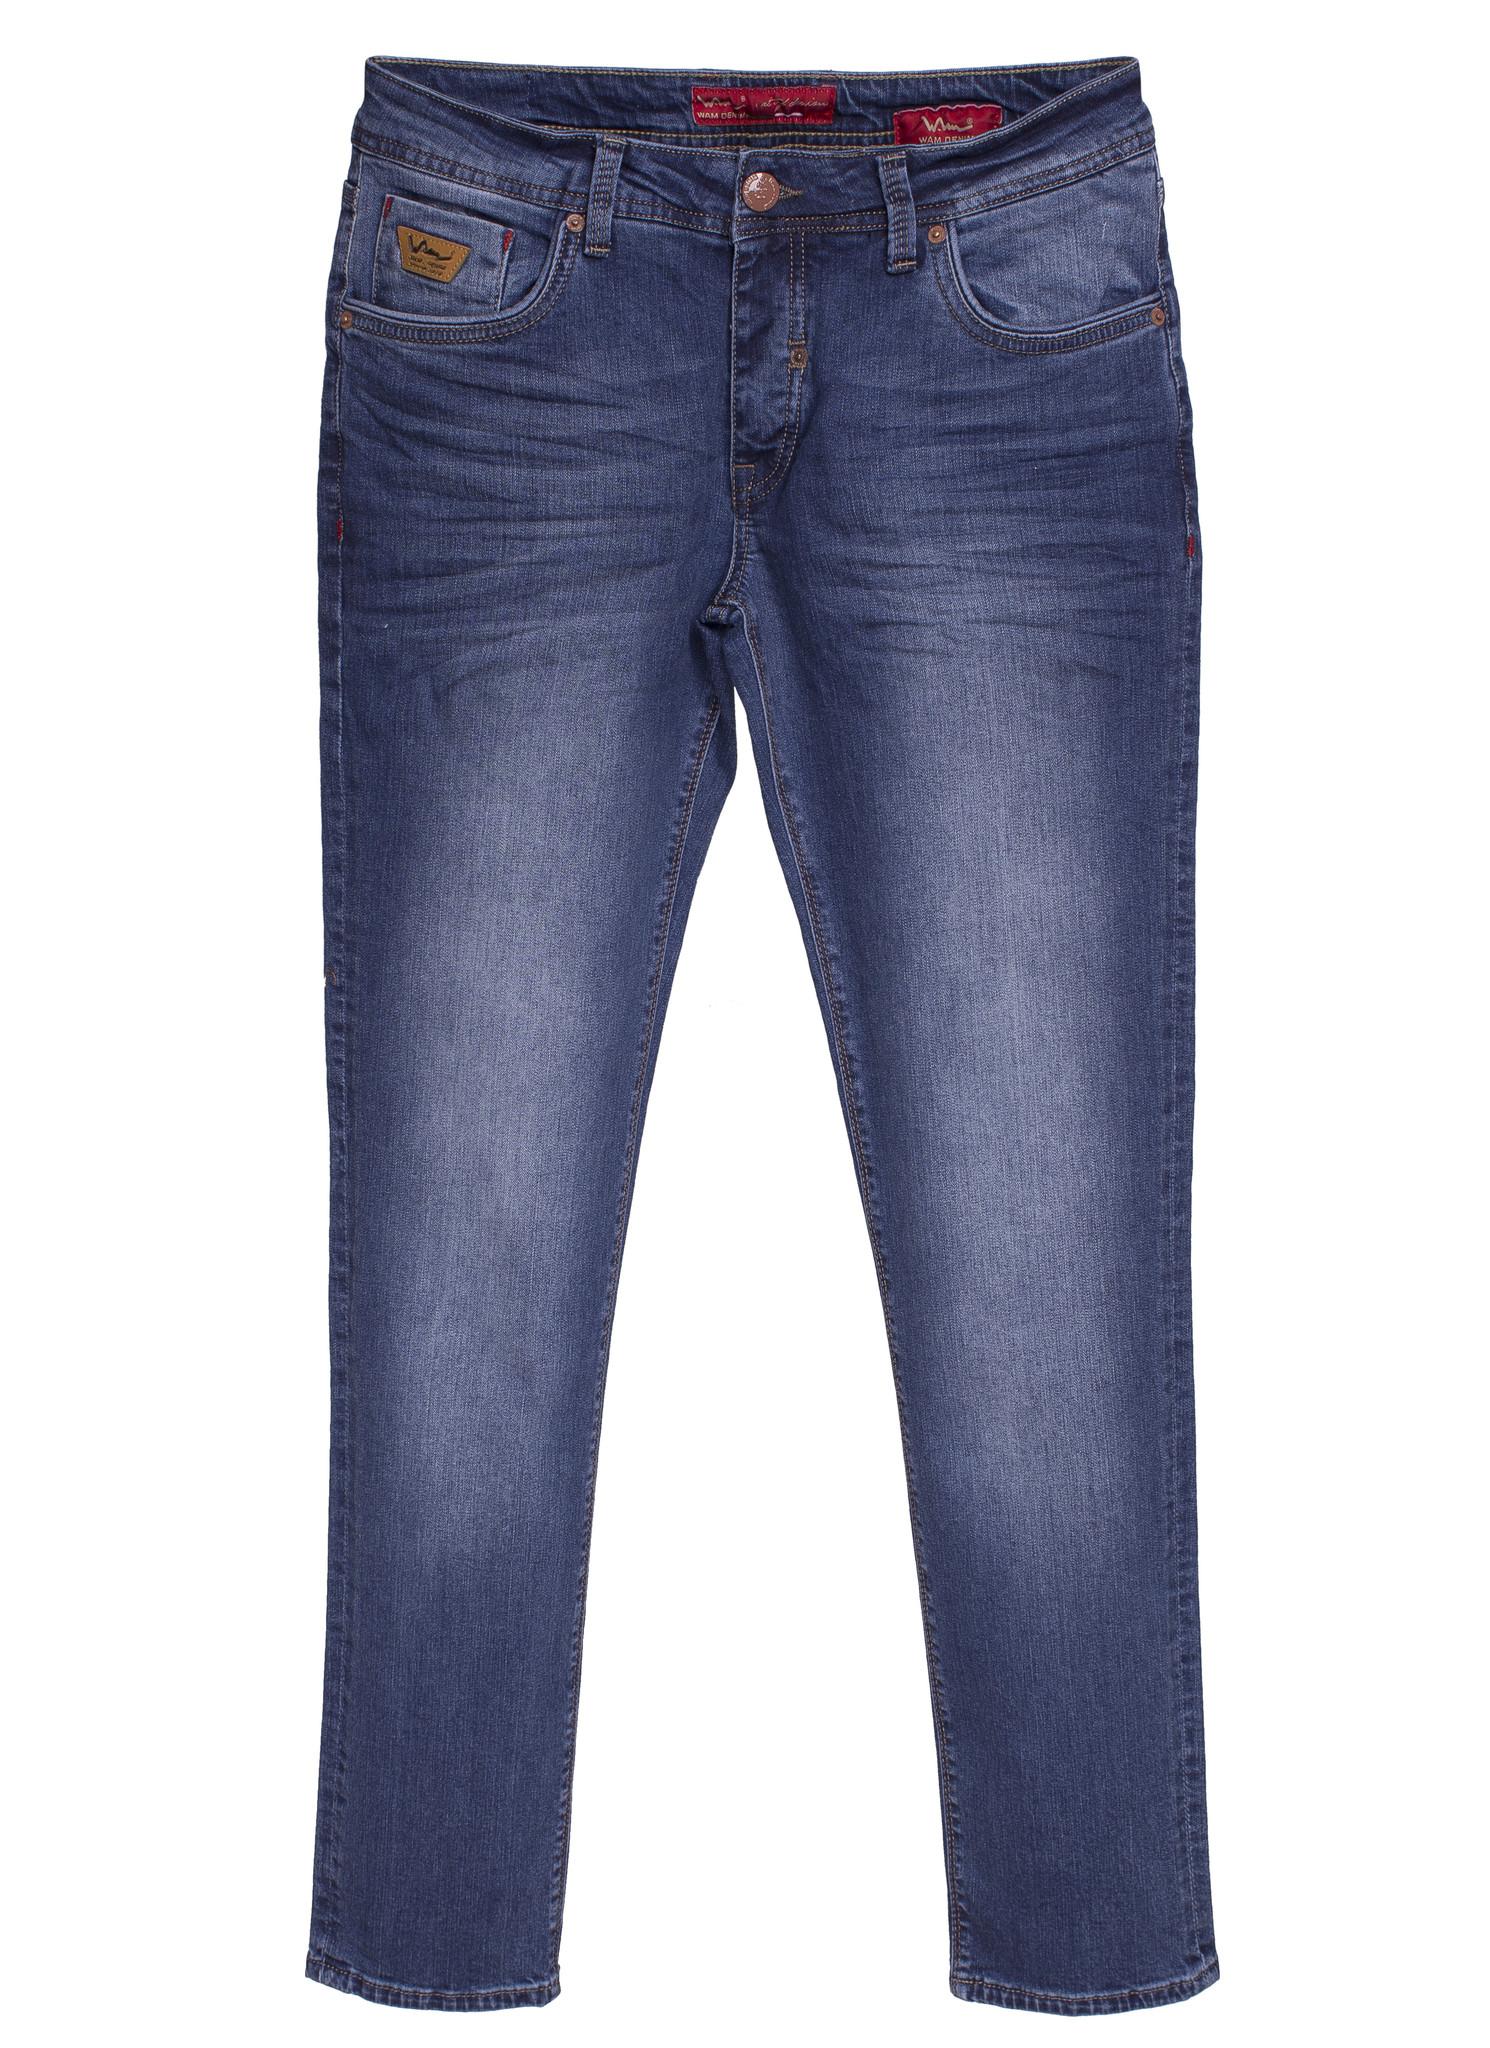 Wam Denim Jeans 92115 Blue